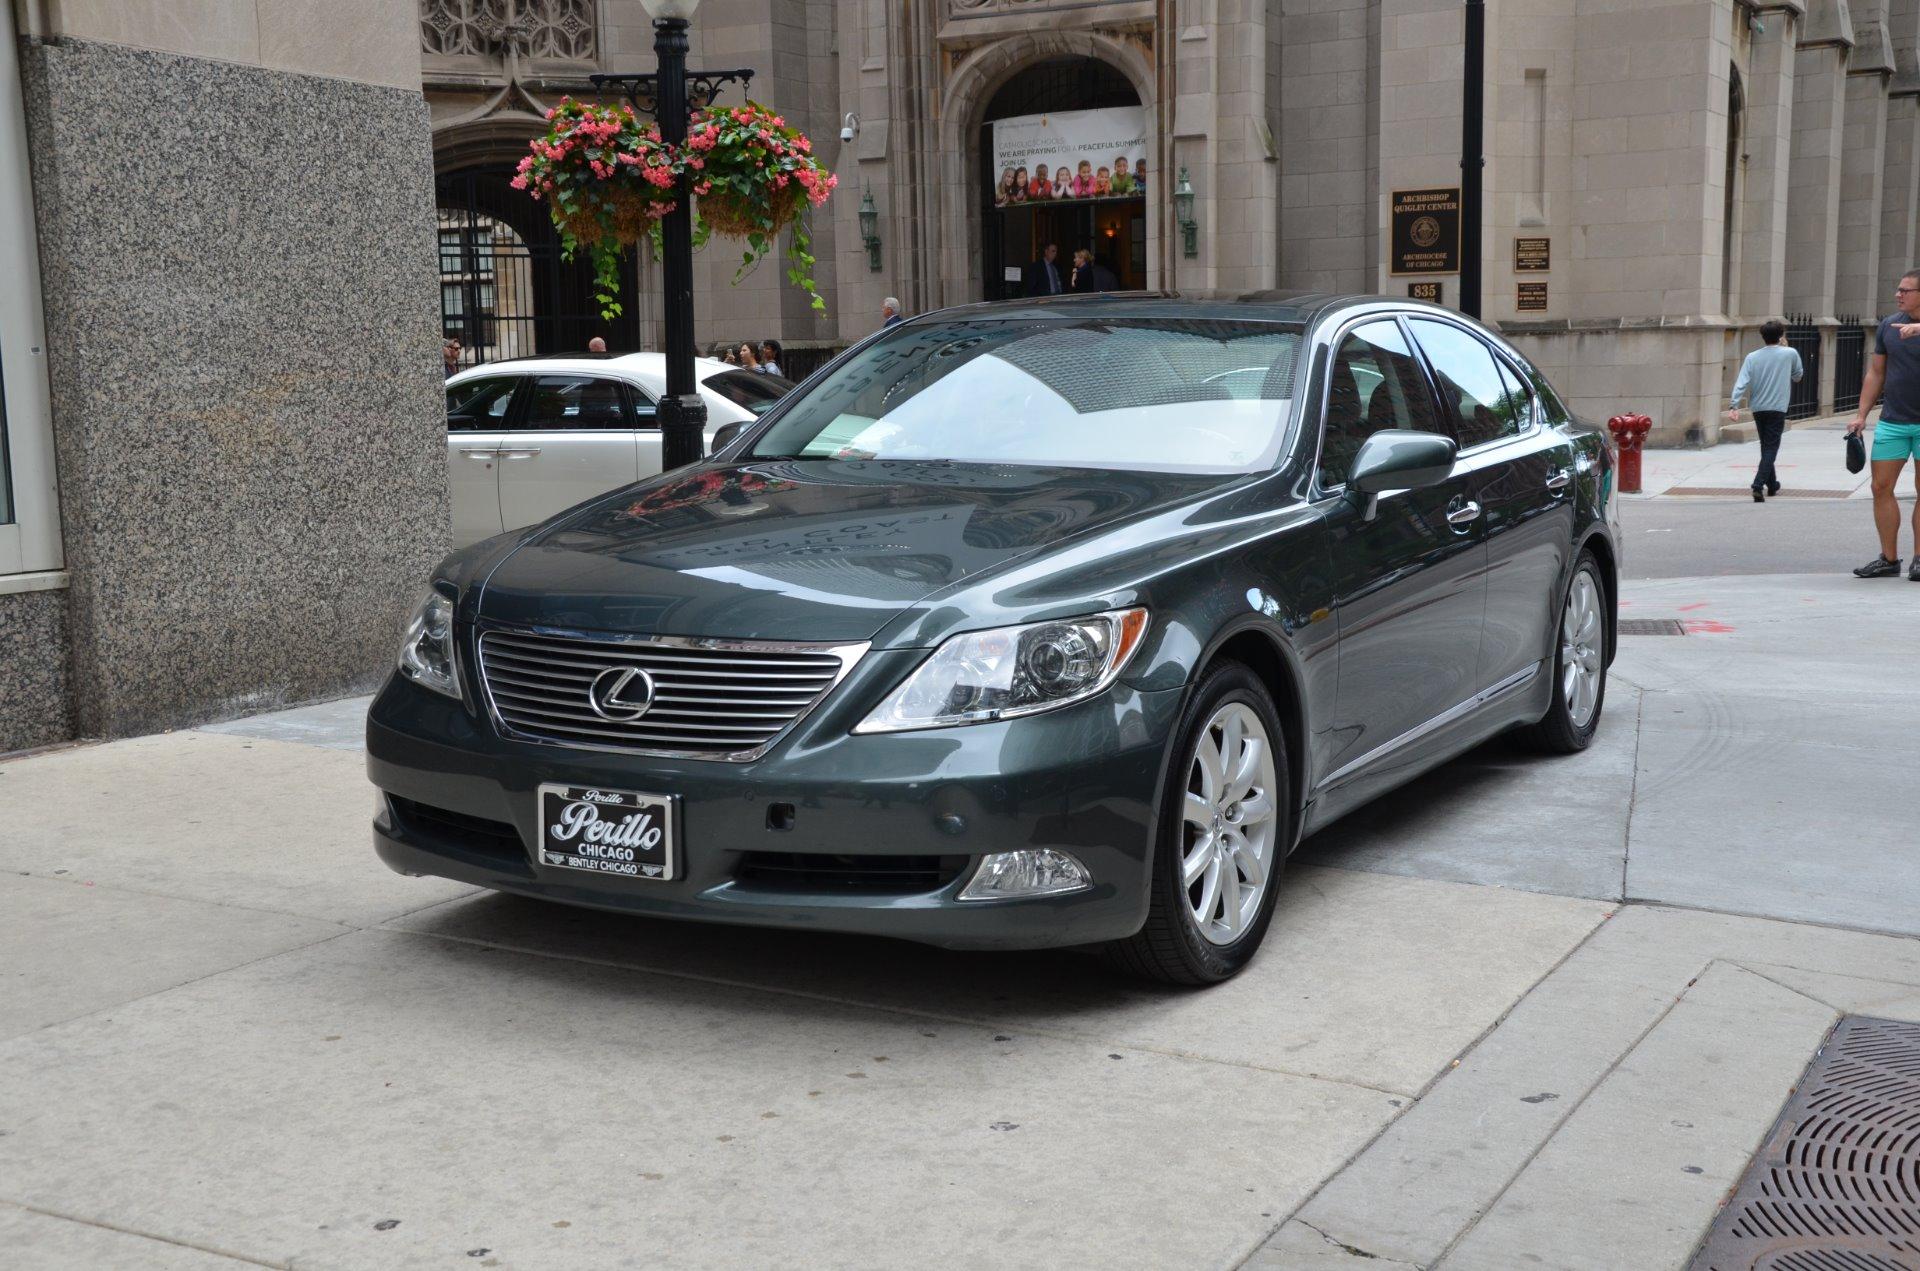 2007 Lexus LS 460 Stock for sale near Chicago IL